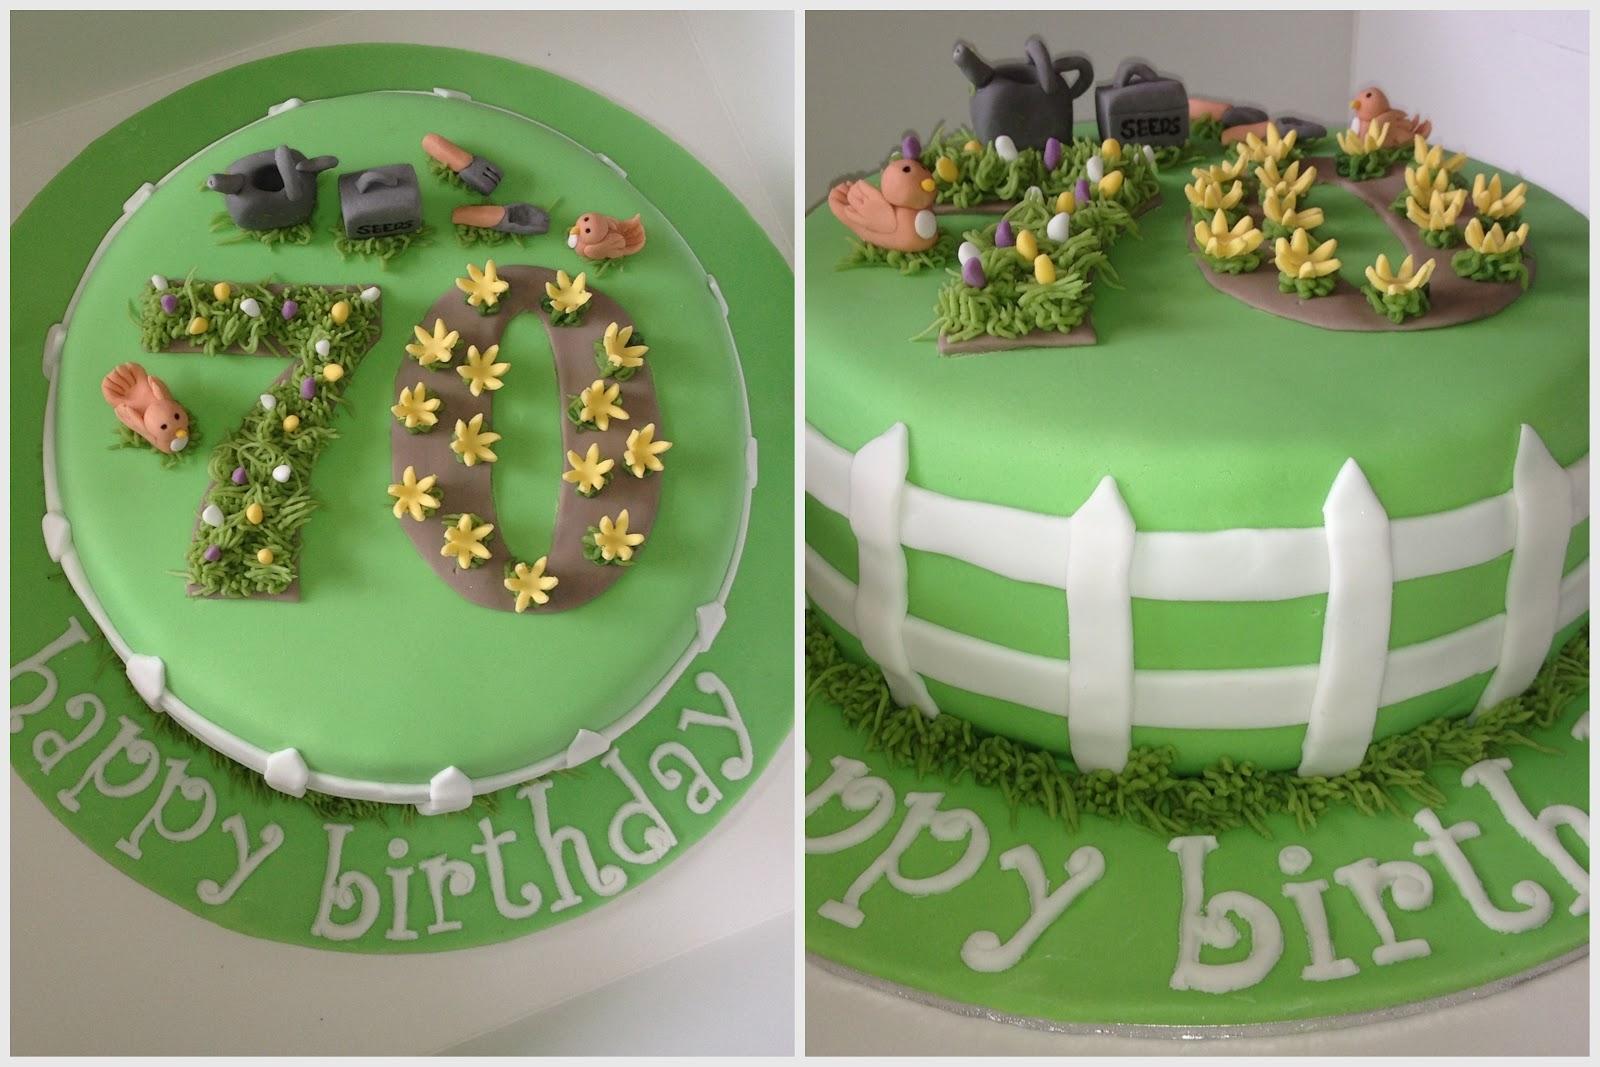 The Bohemian Bakery: Gardening Themed Cake